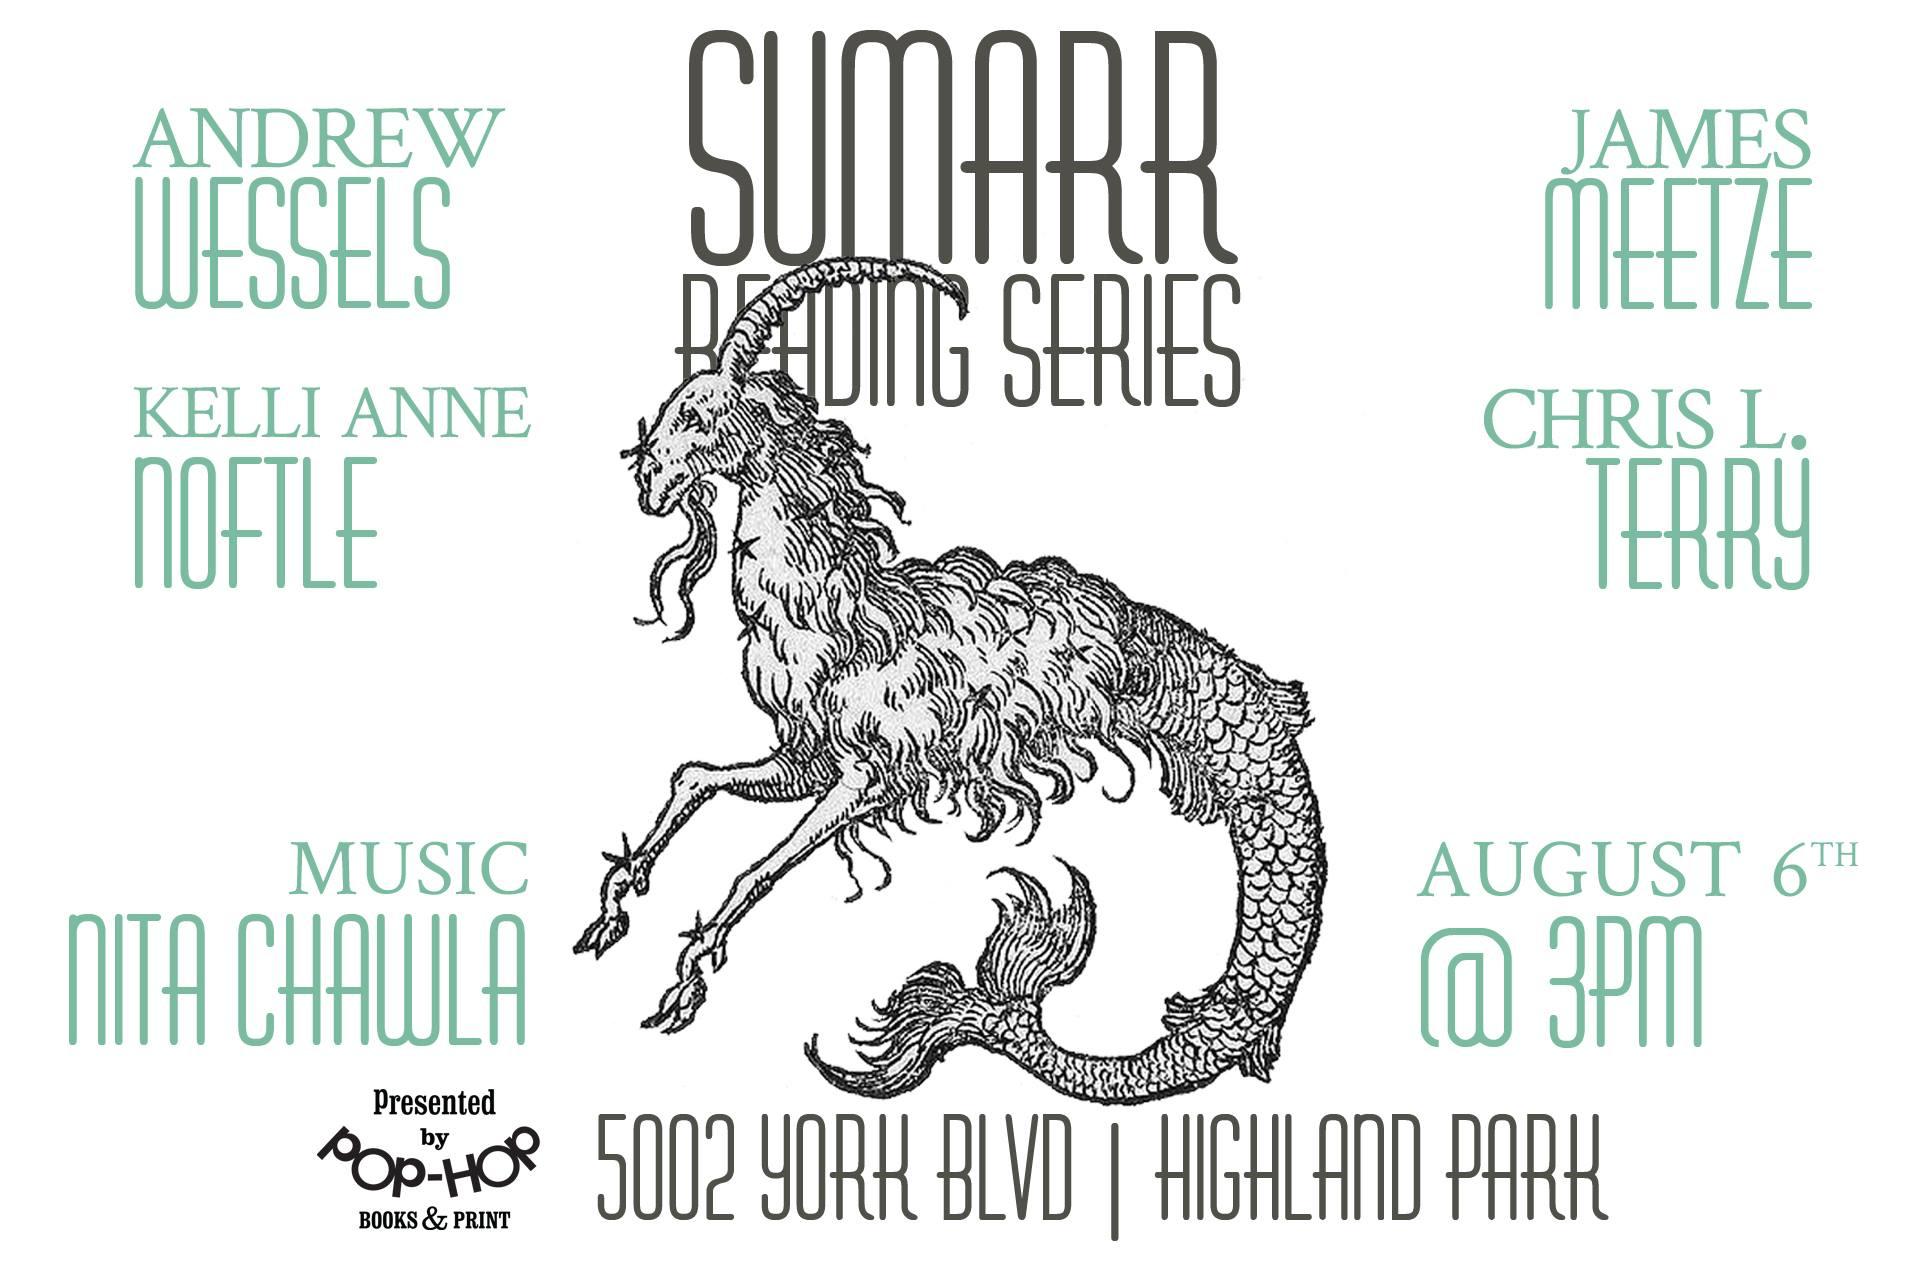 SUMARR: READING SERIES - 08/06/2017